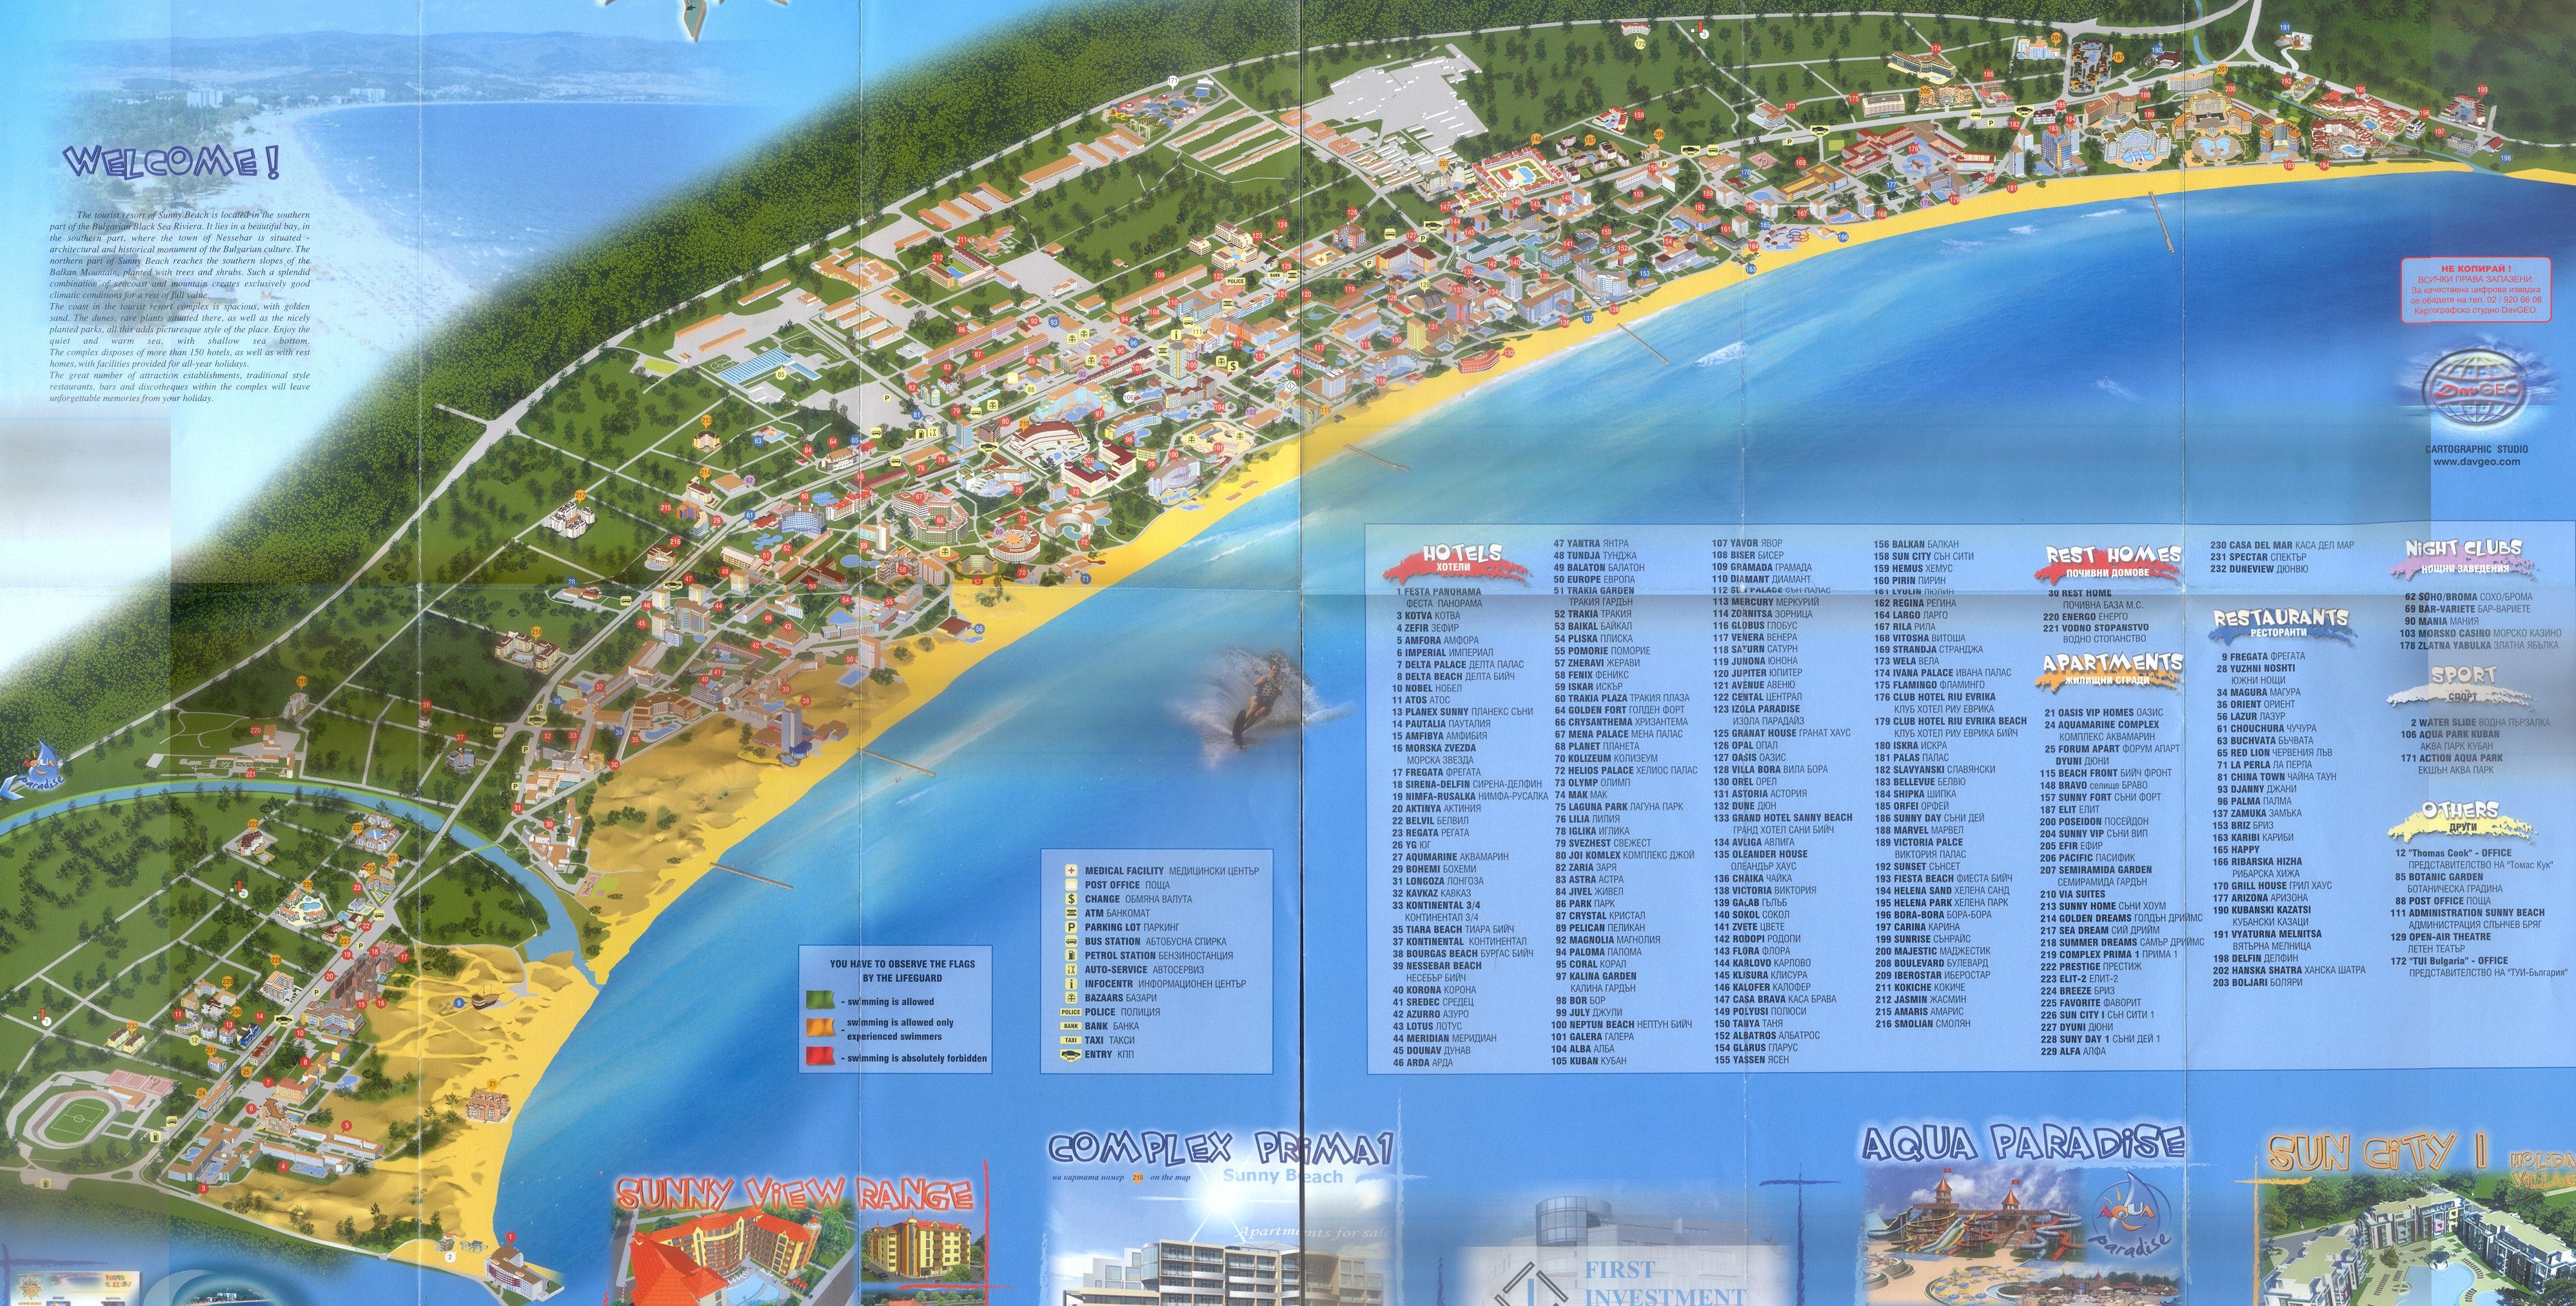 Sunny Beach Map Nessebar Bulgaria Mappery